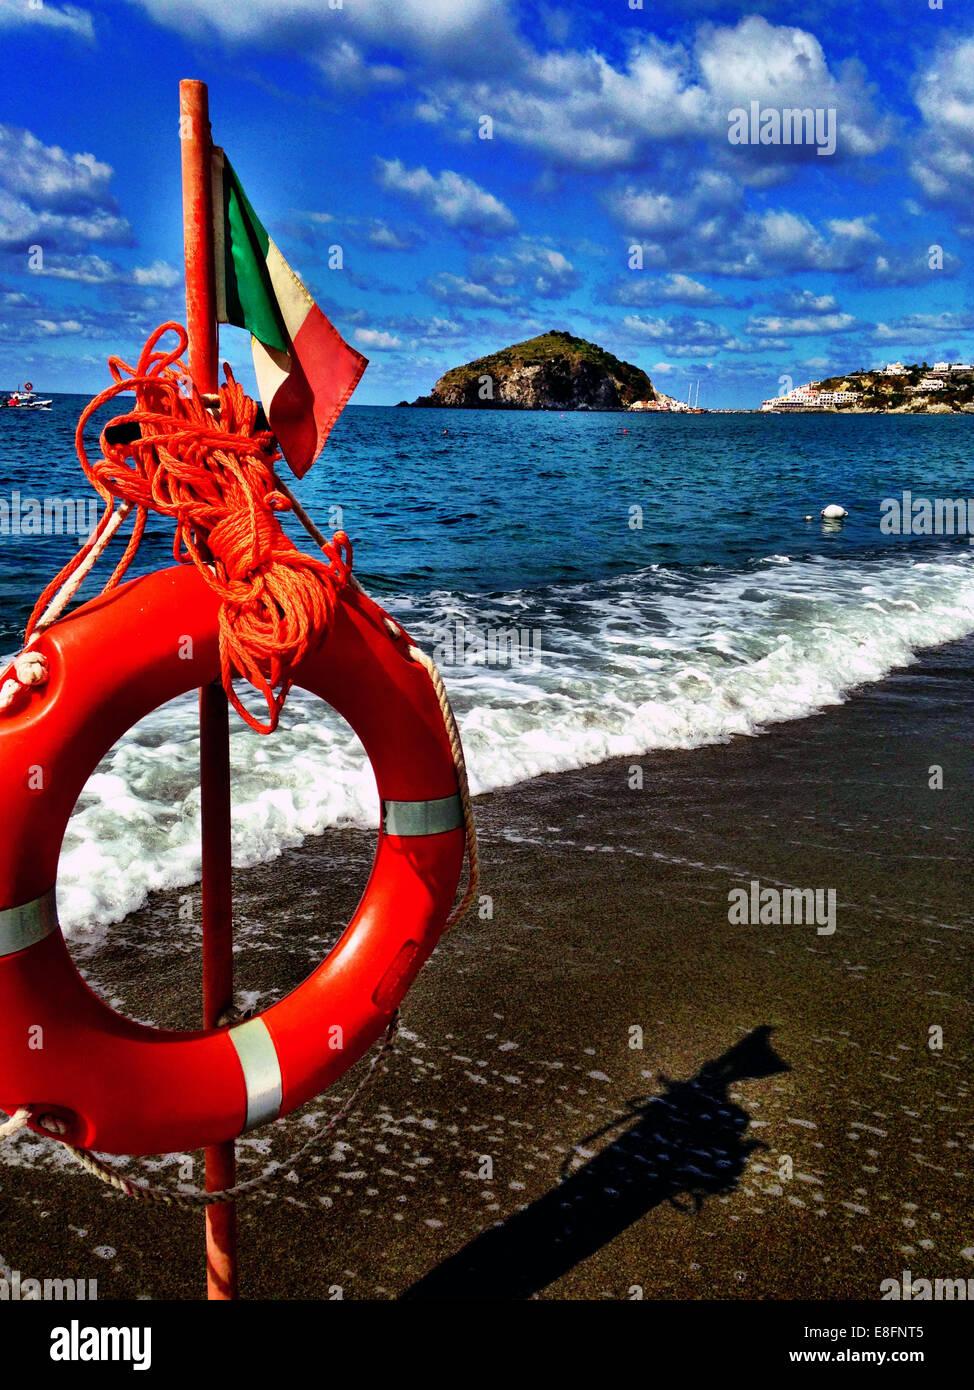 Italy, Ischia, Life preserver on wooden post on beach - Stock Image